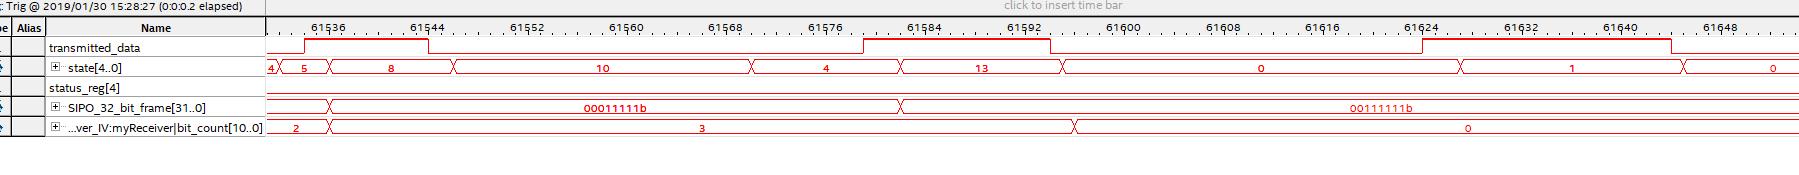 Bizarre Verilog FSM error, please help explain